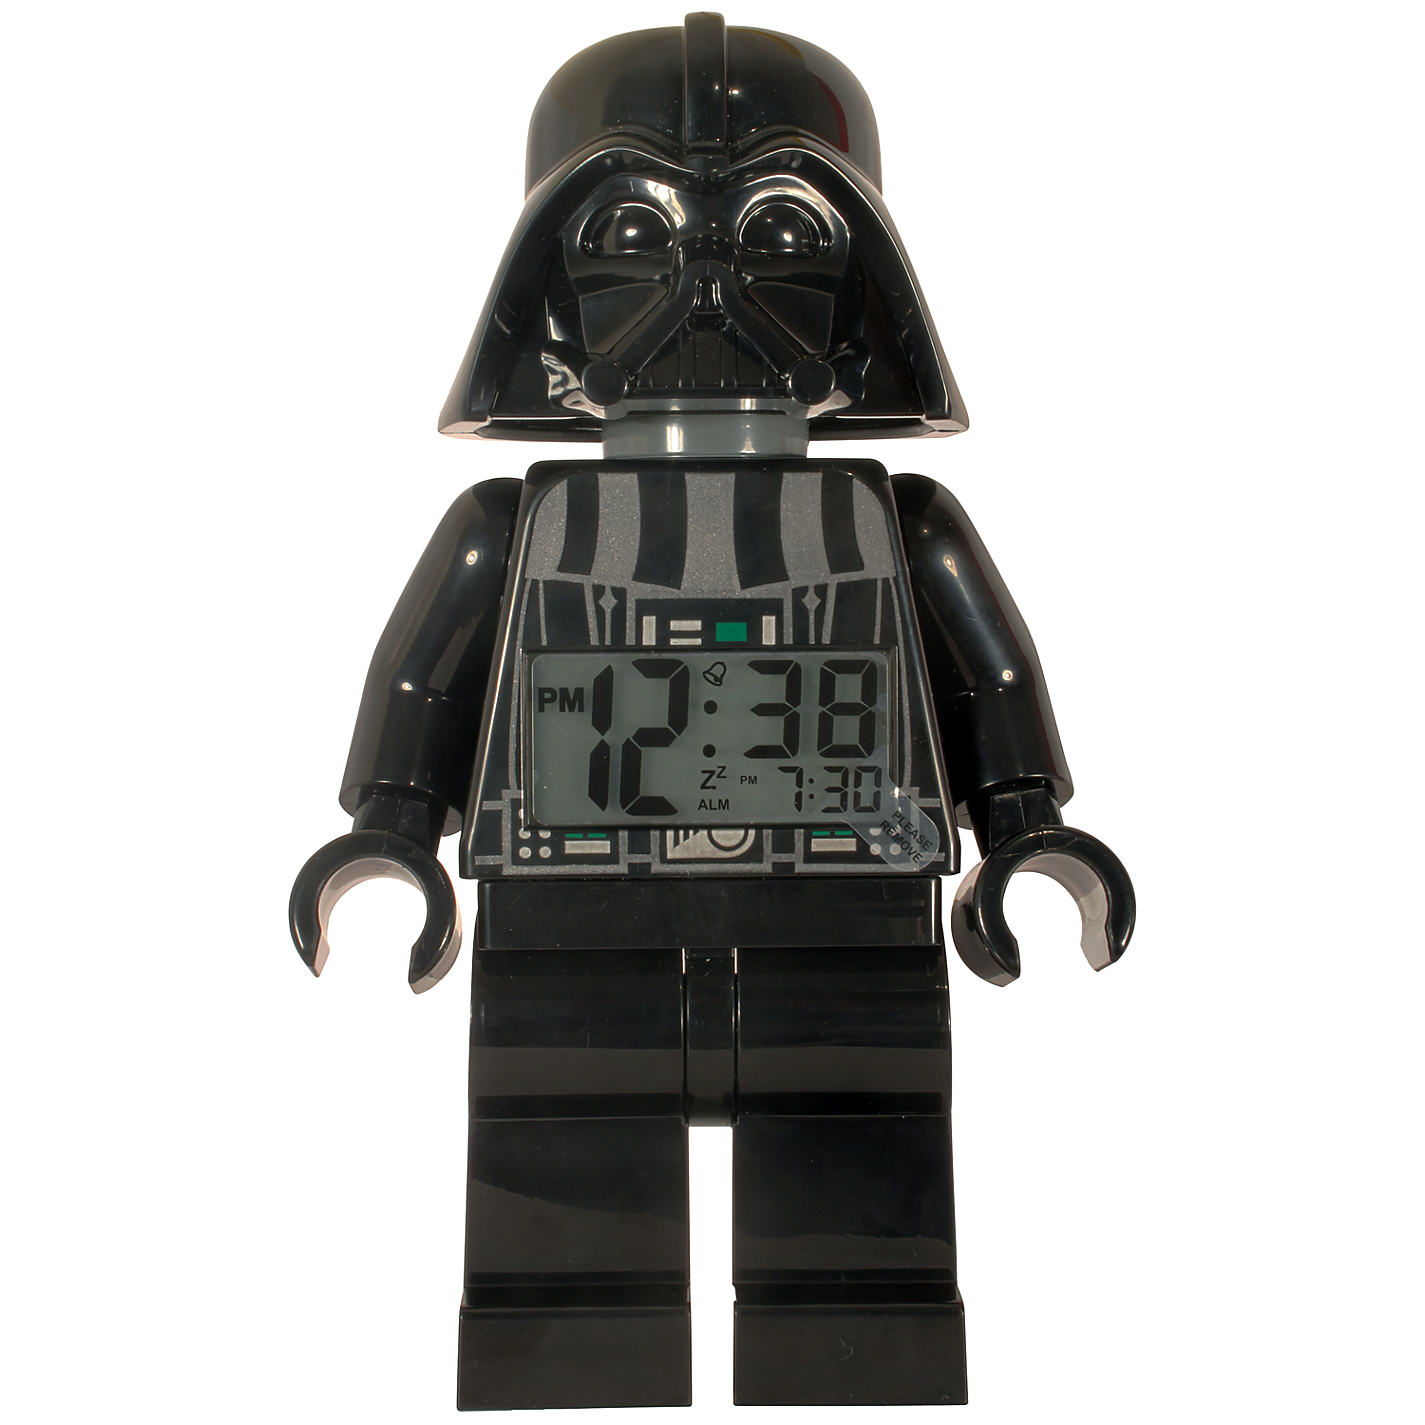 Lego star wars darth vader alarm clock - Bd lego star wars ...